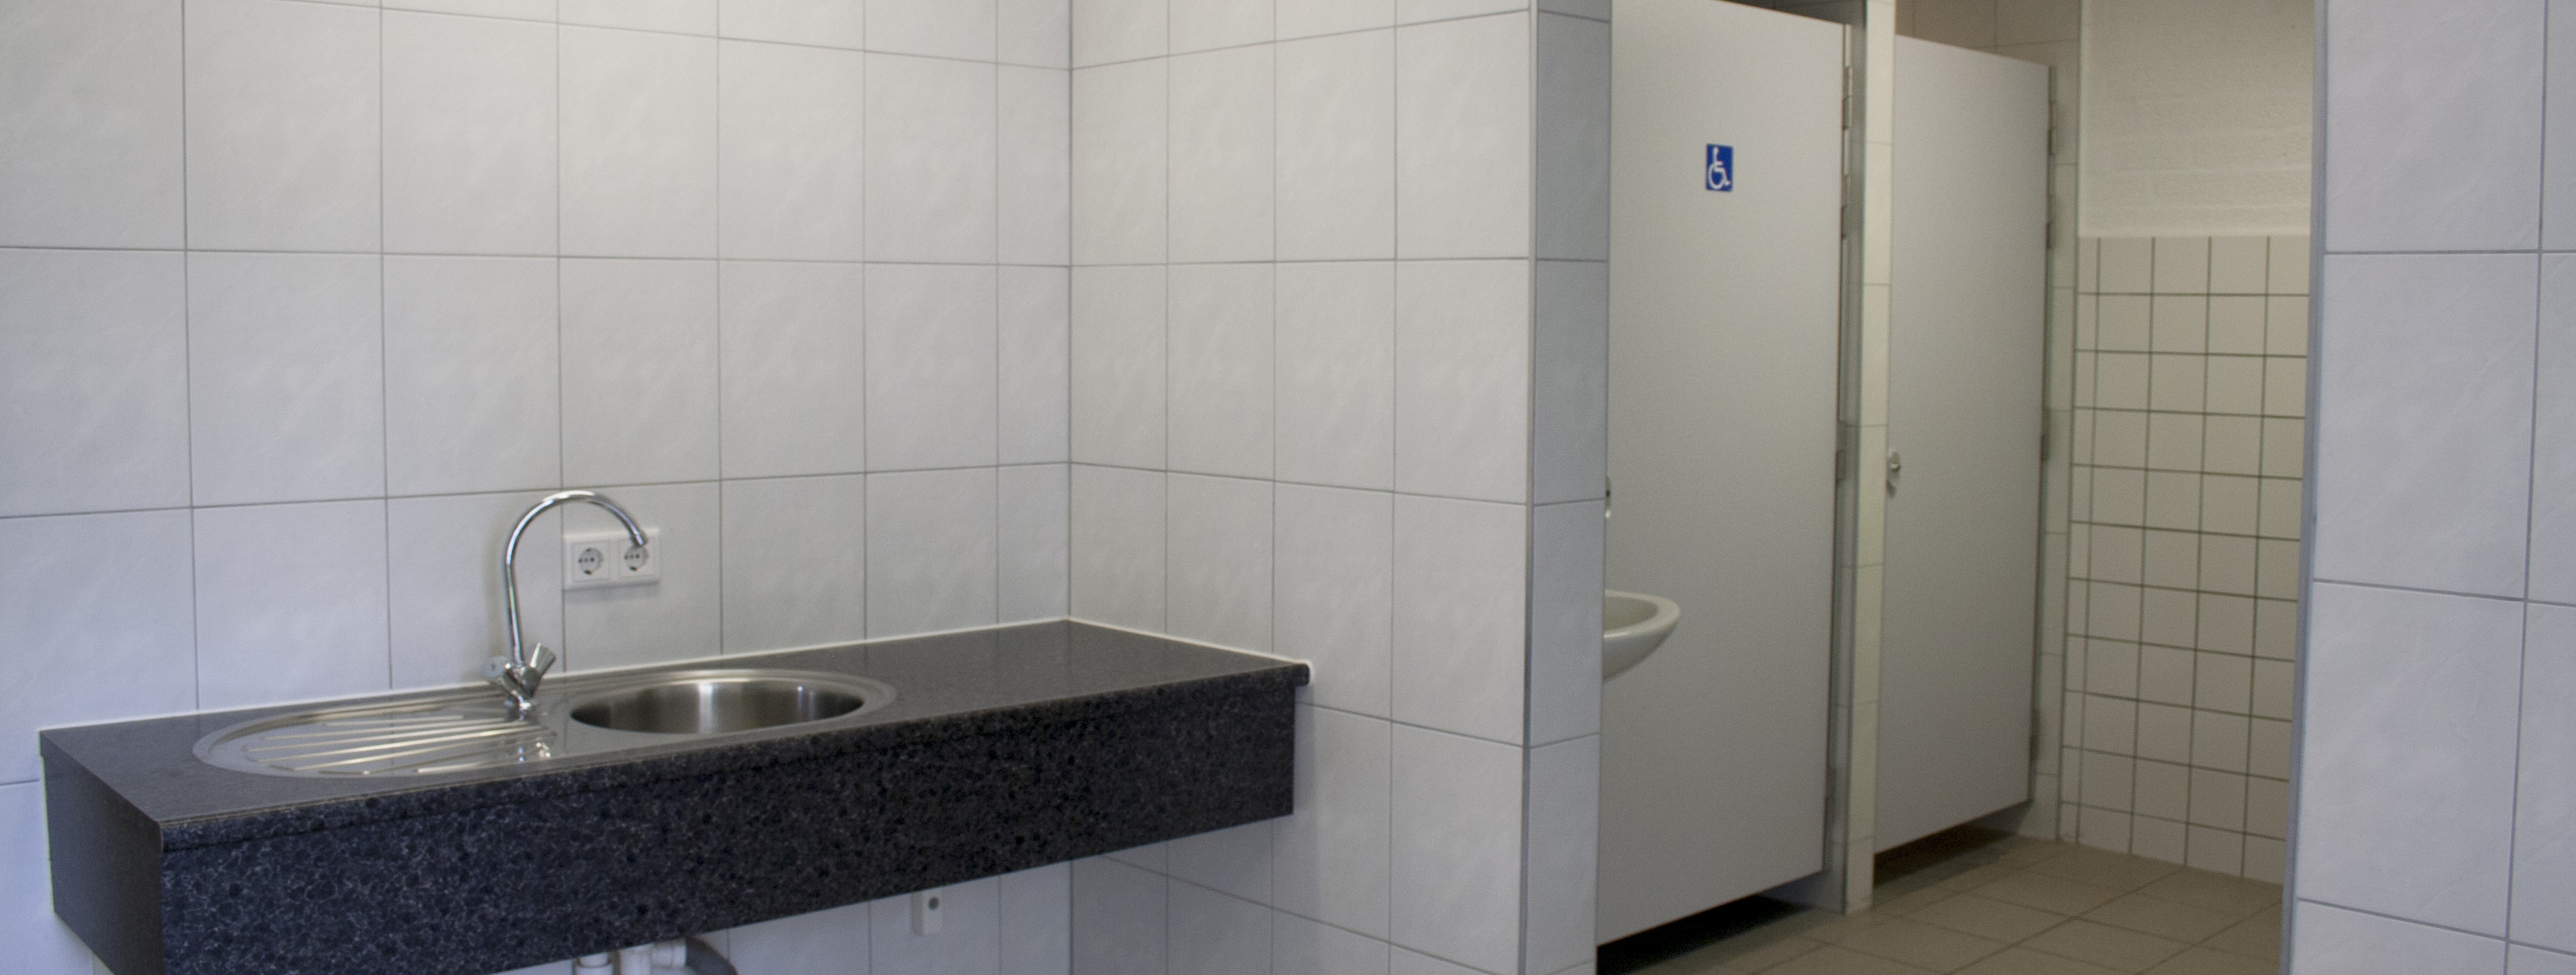 Sanitaire2-1